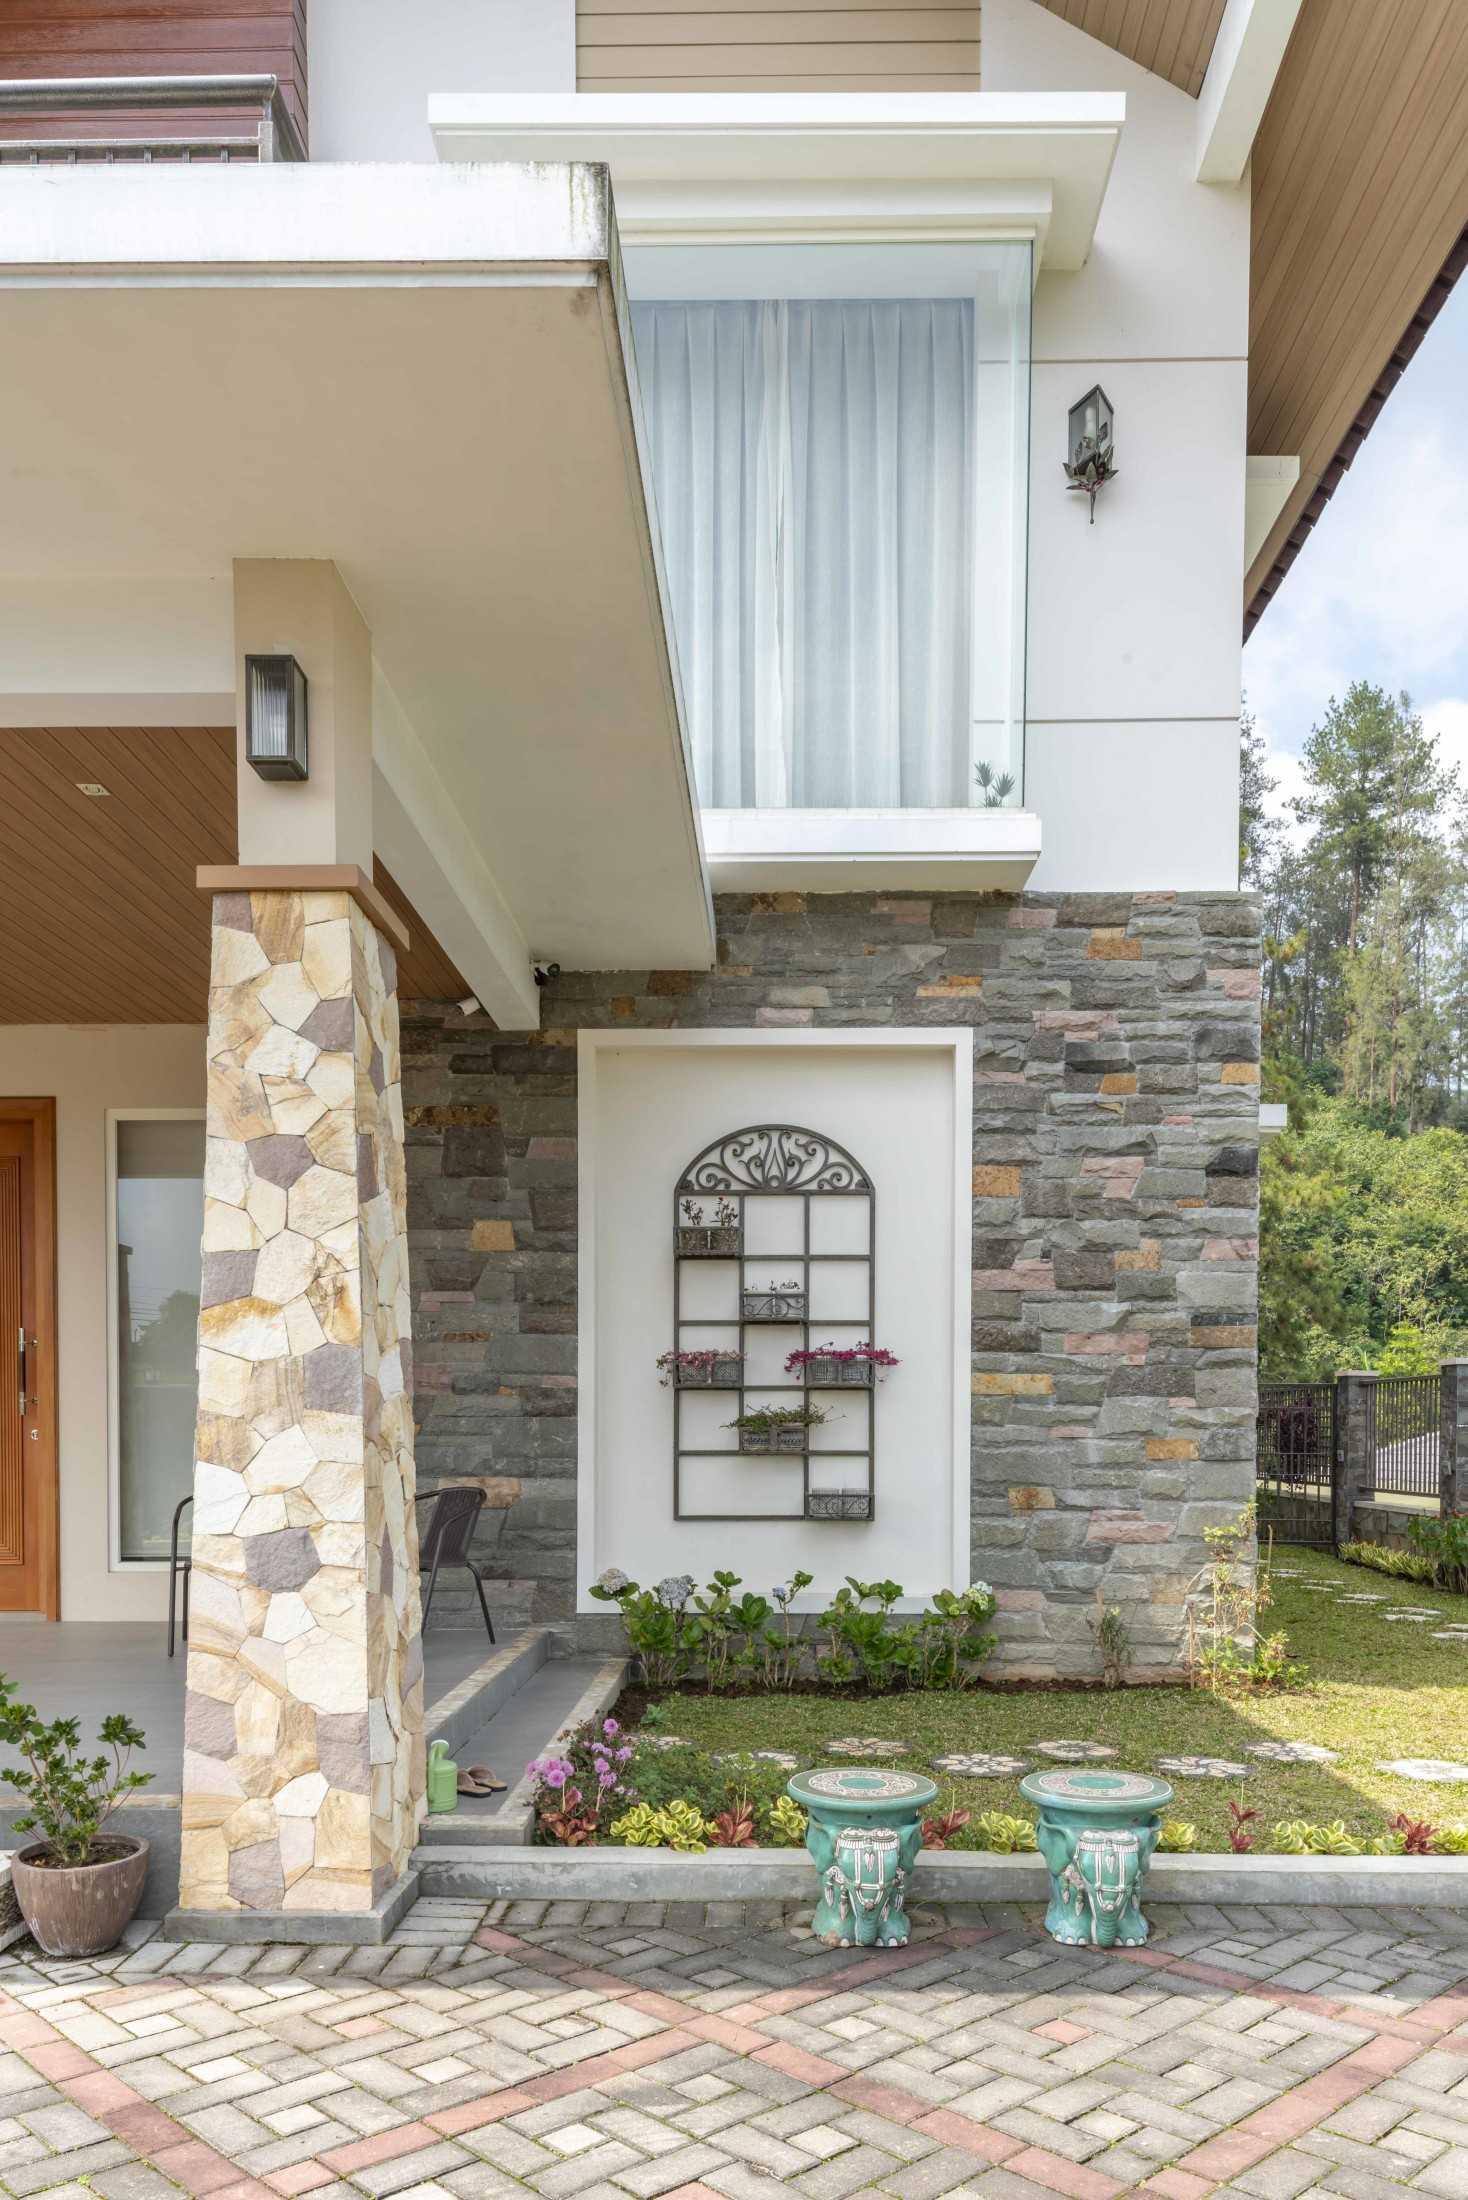 Conarch Studio Breezy Tropical Villa Kec. Tawangmangu, Kabupaten Karanganyar, Jawa Tengah, Indonesia Kec. Tawangmangu, Kabupaten Karanganyar, Jawa Tengah, Indonesia Exterior  126659